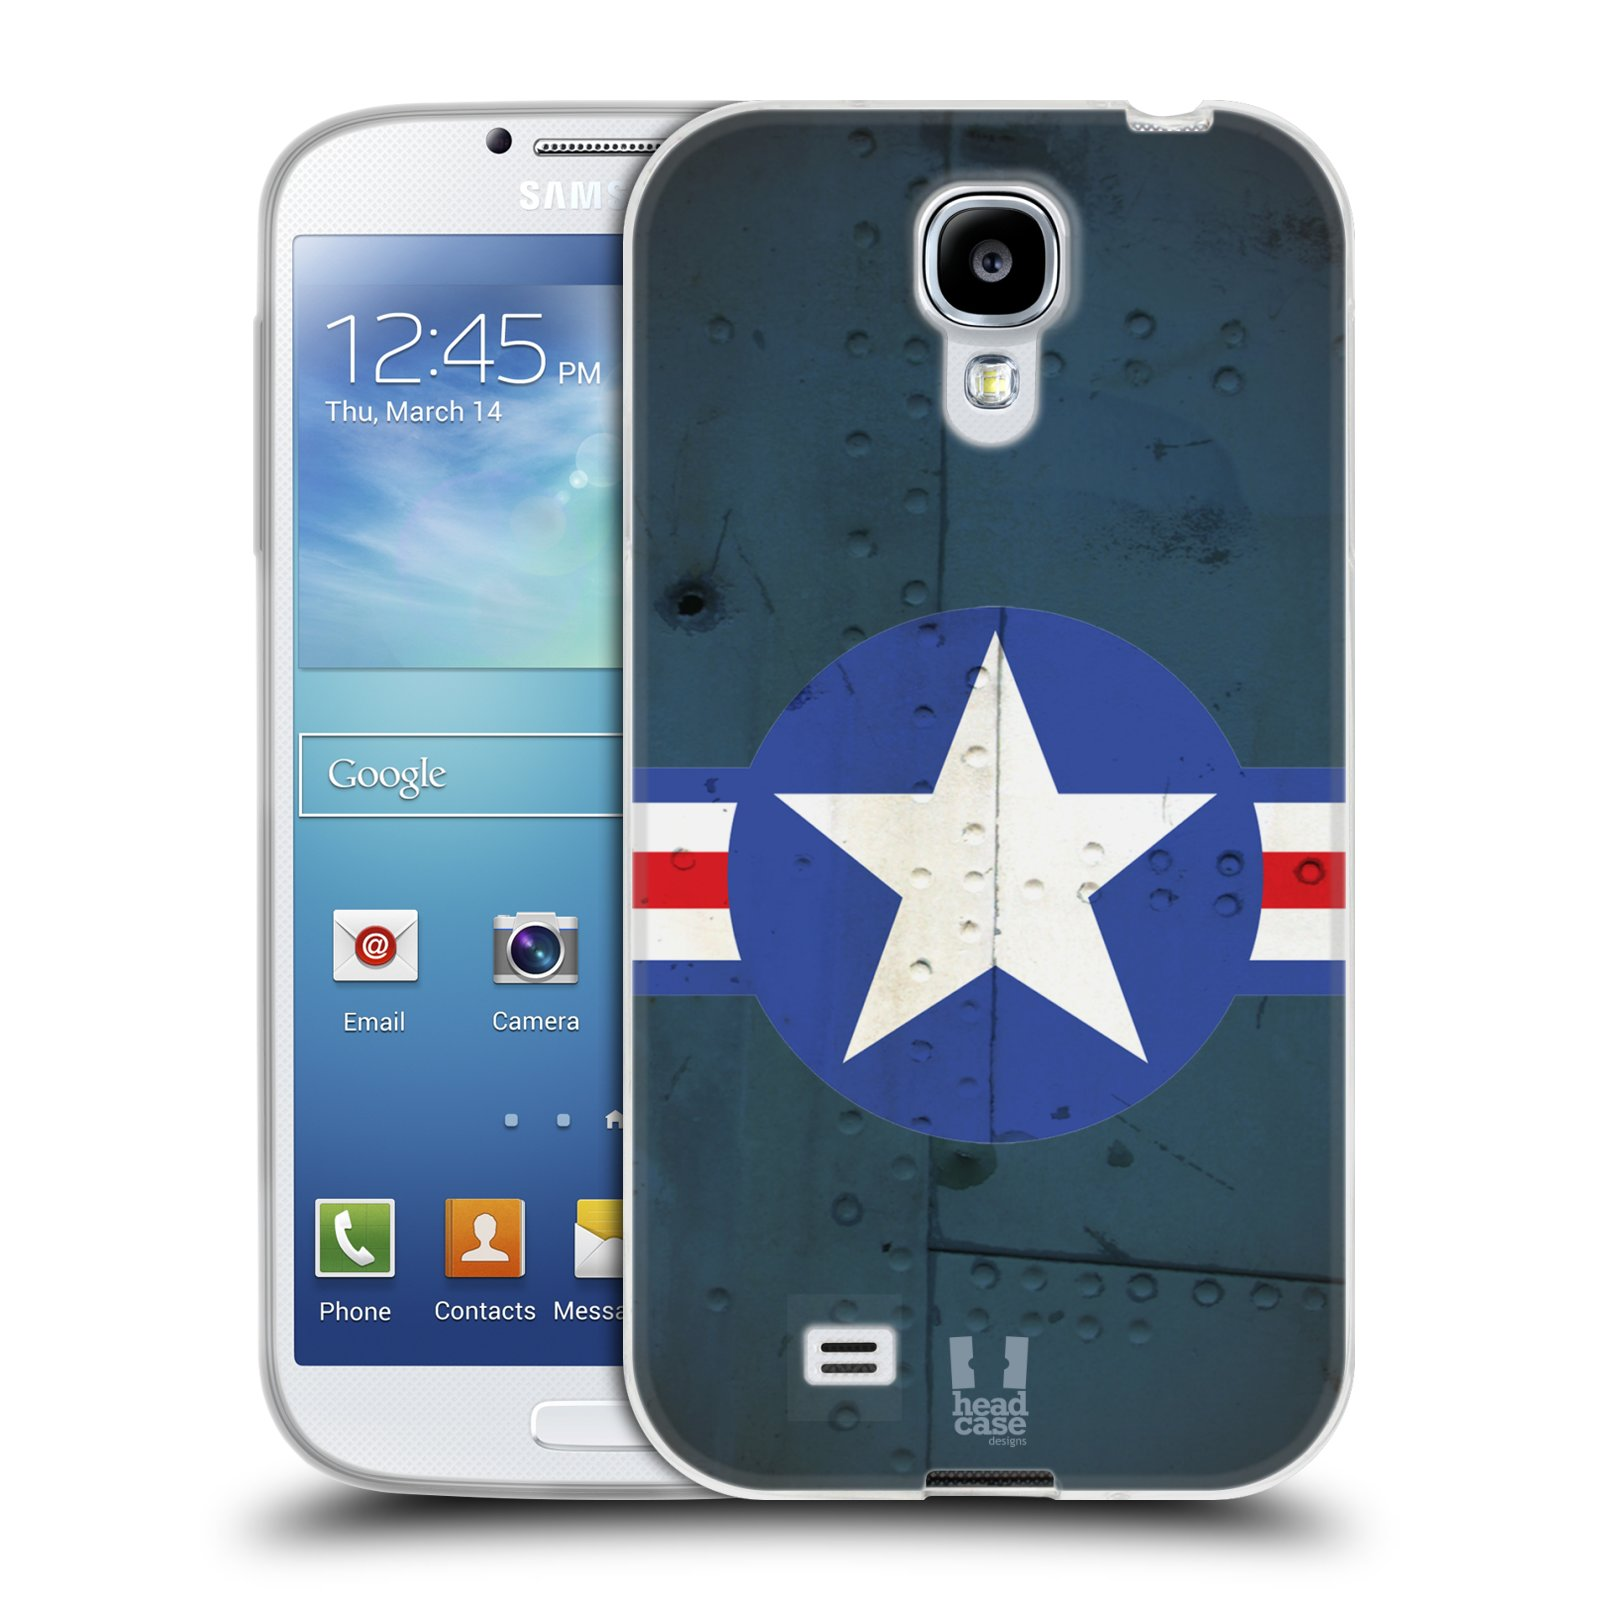 Silikonové pouzdro na mobil Samsung Galaxy S4 HEAD CASE POSTWAR (Silikonový kryt či obal na mobilní telefon Samsung Galaxy S4 GT-i9505 / i9500)